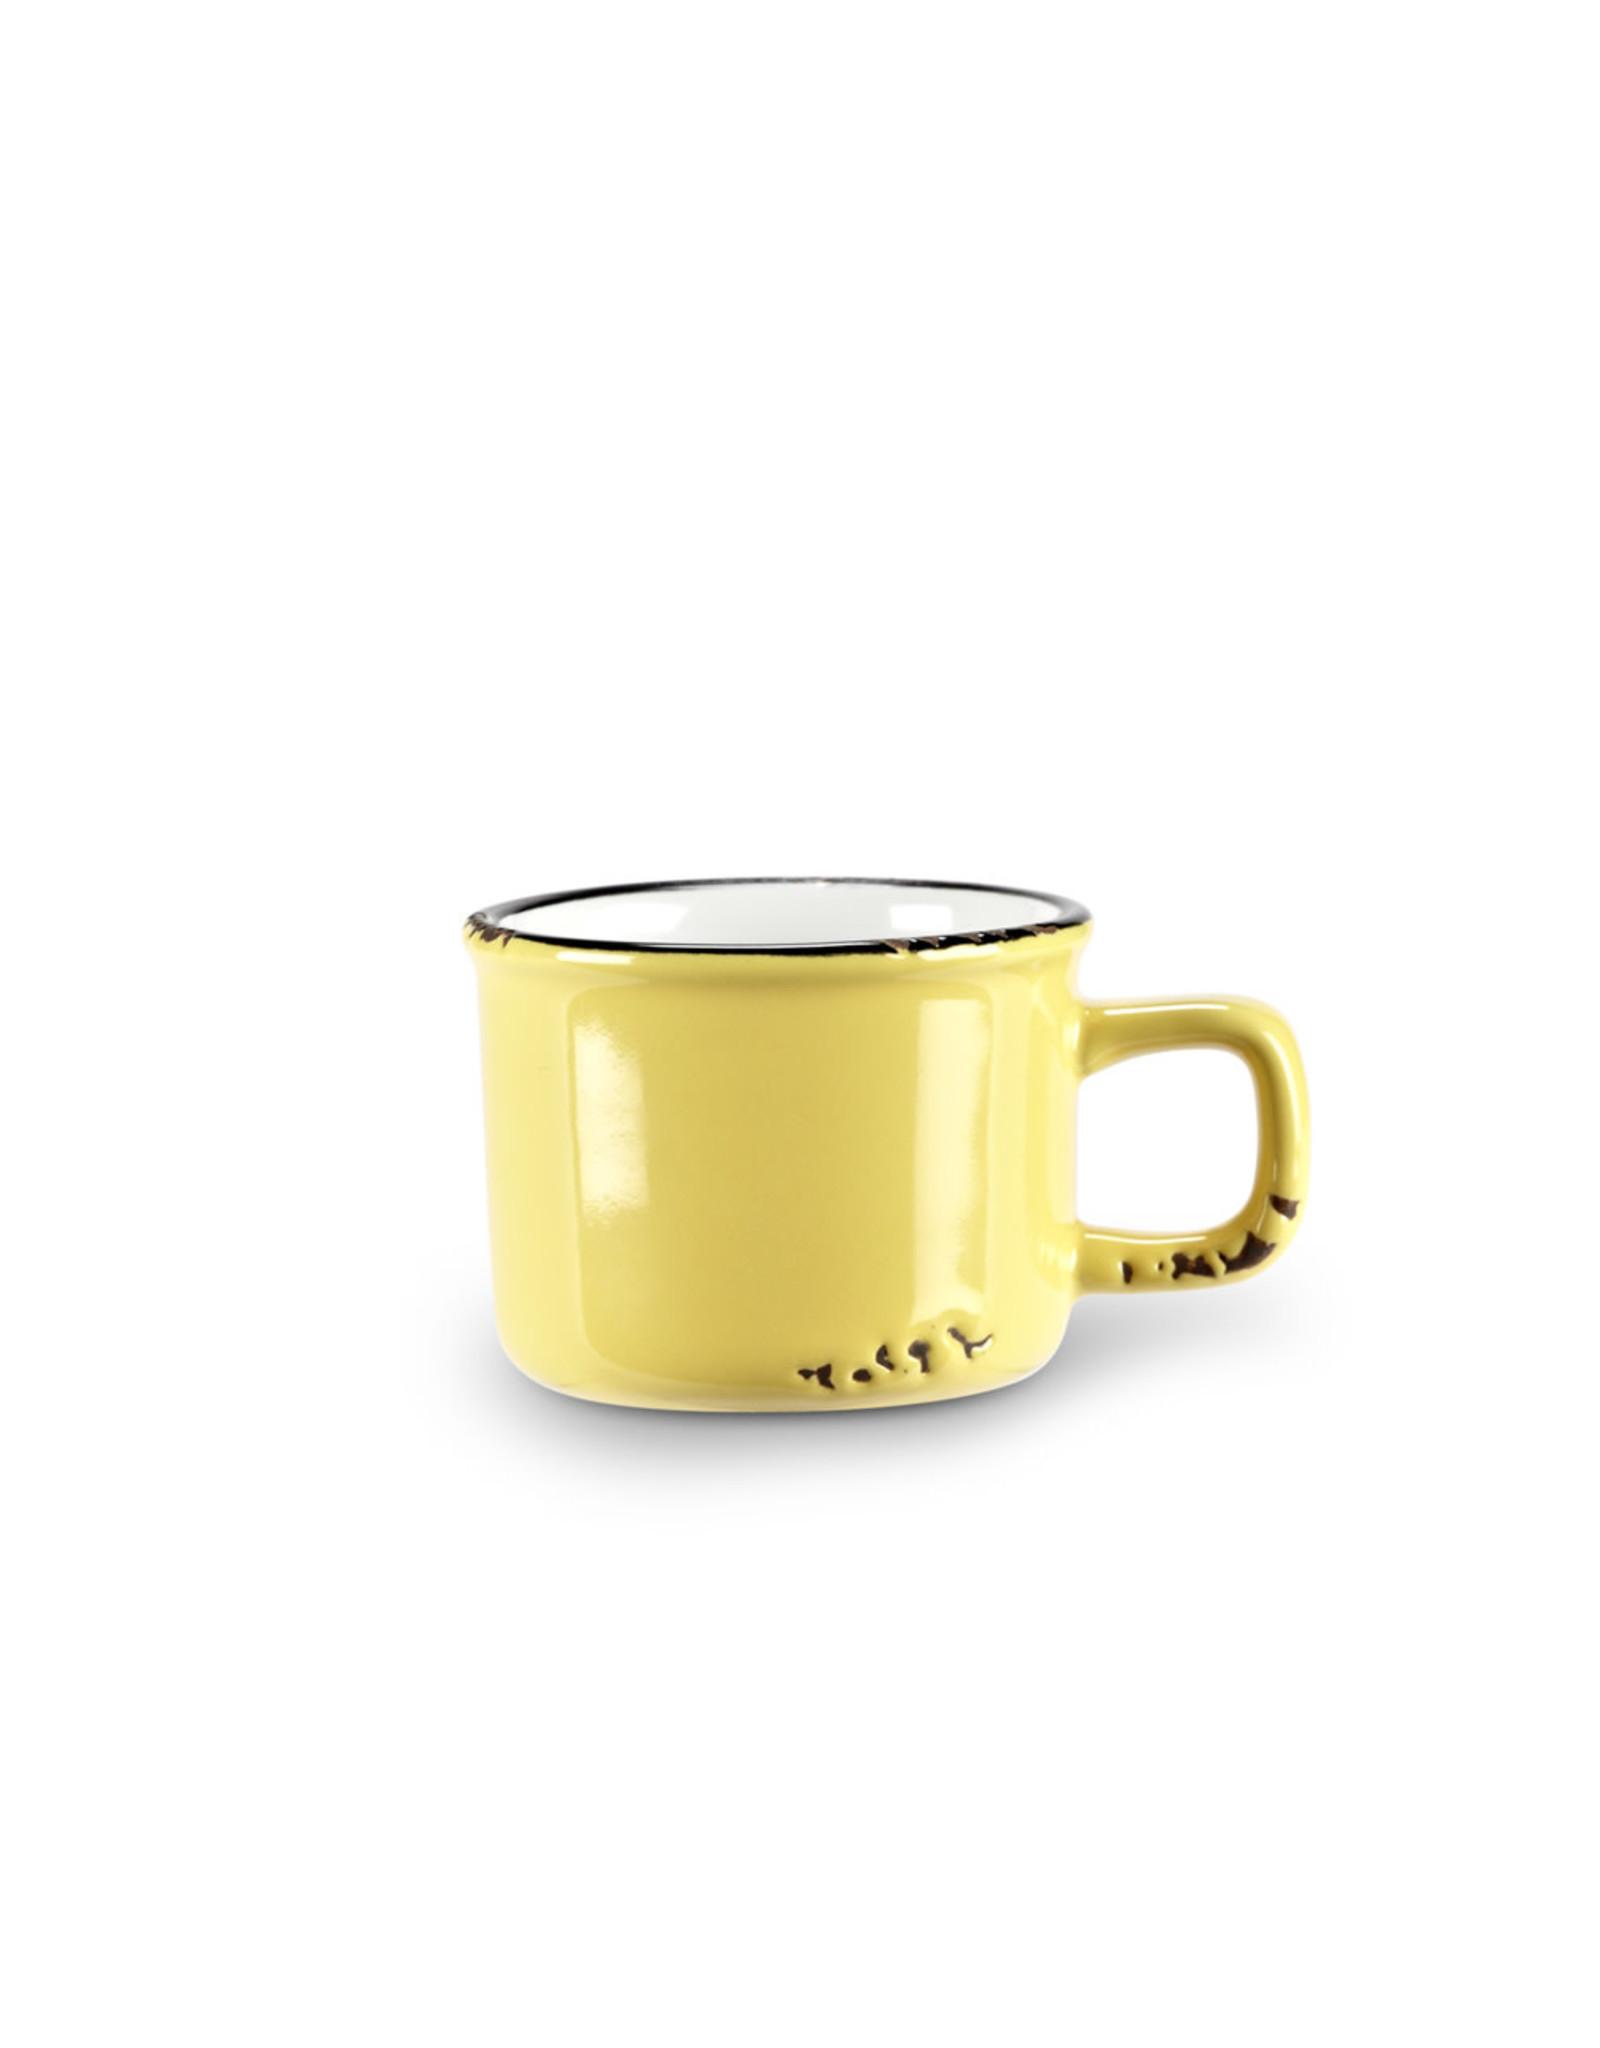 Tasse espresso jaune en grès (3 oz)